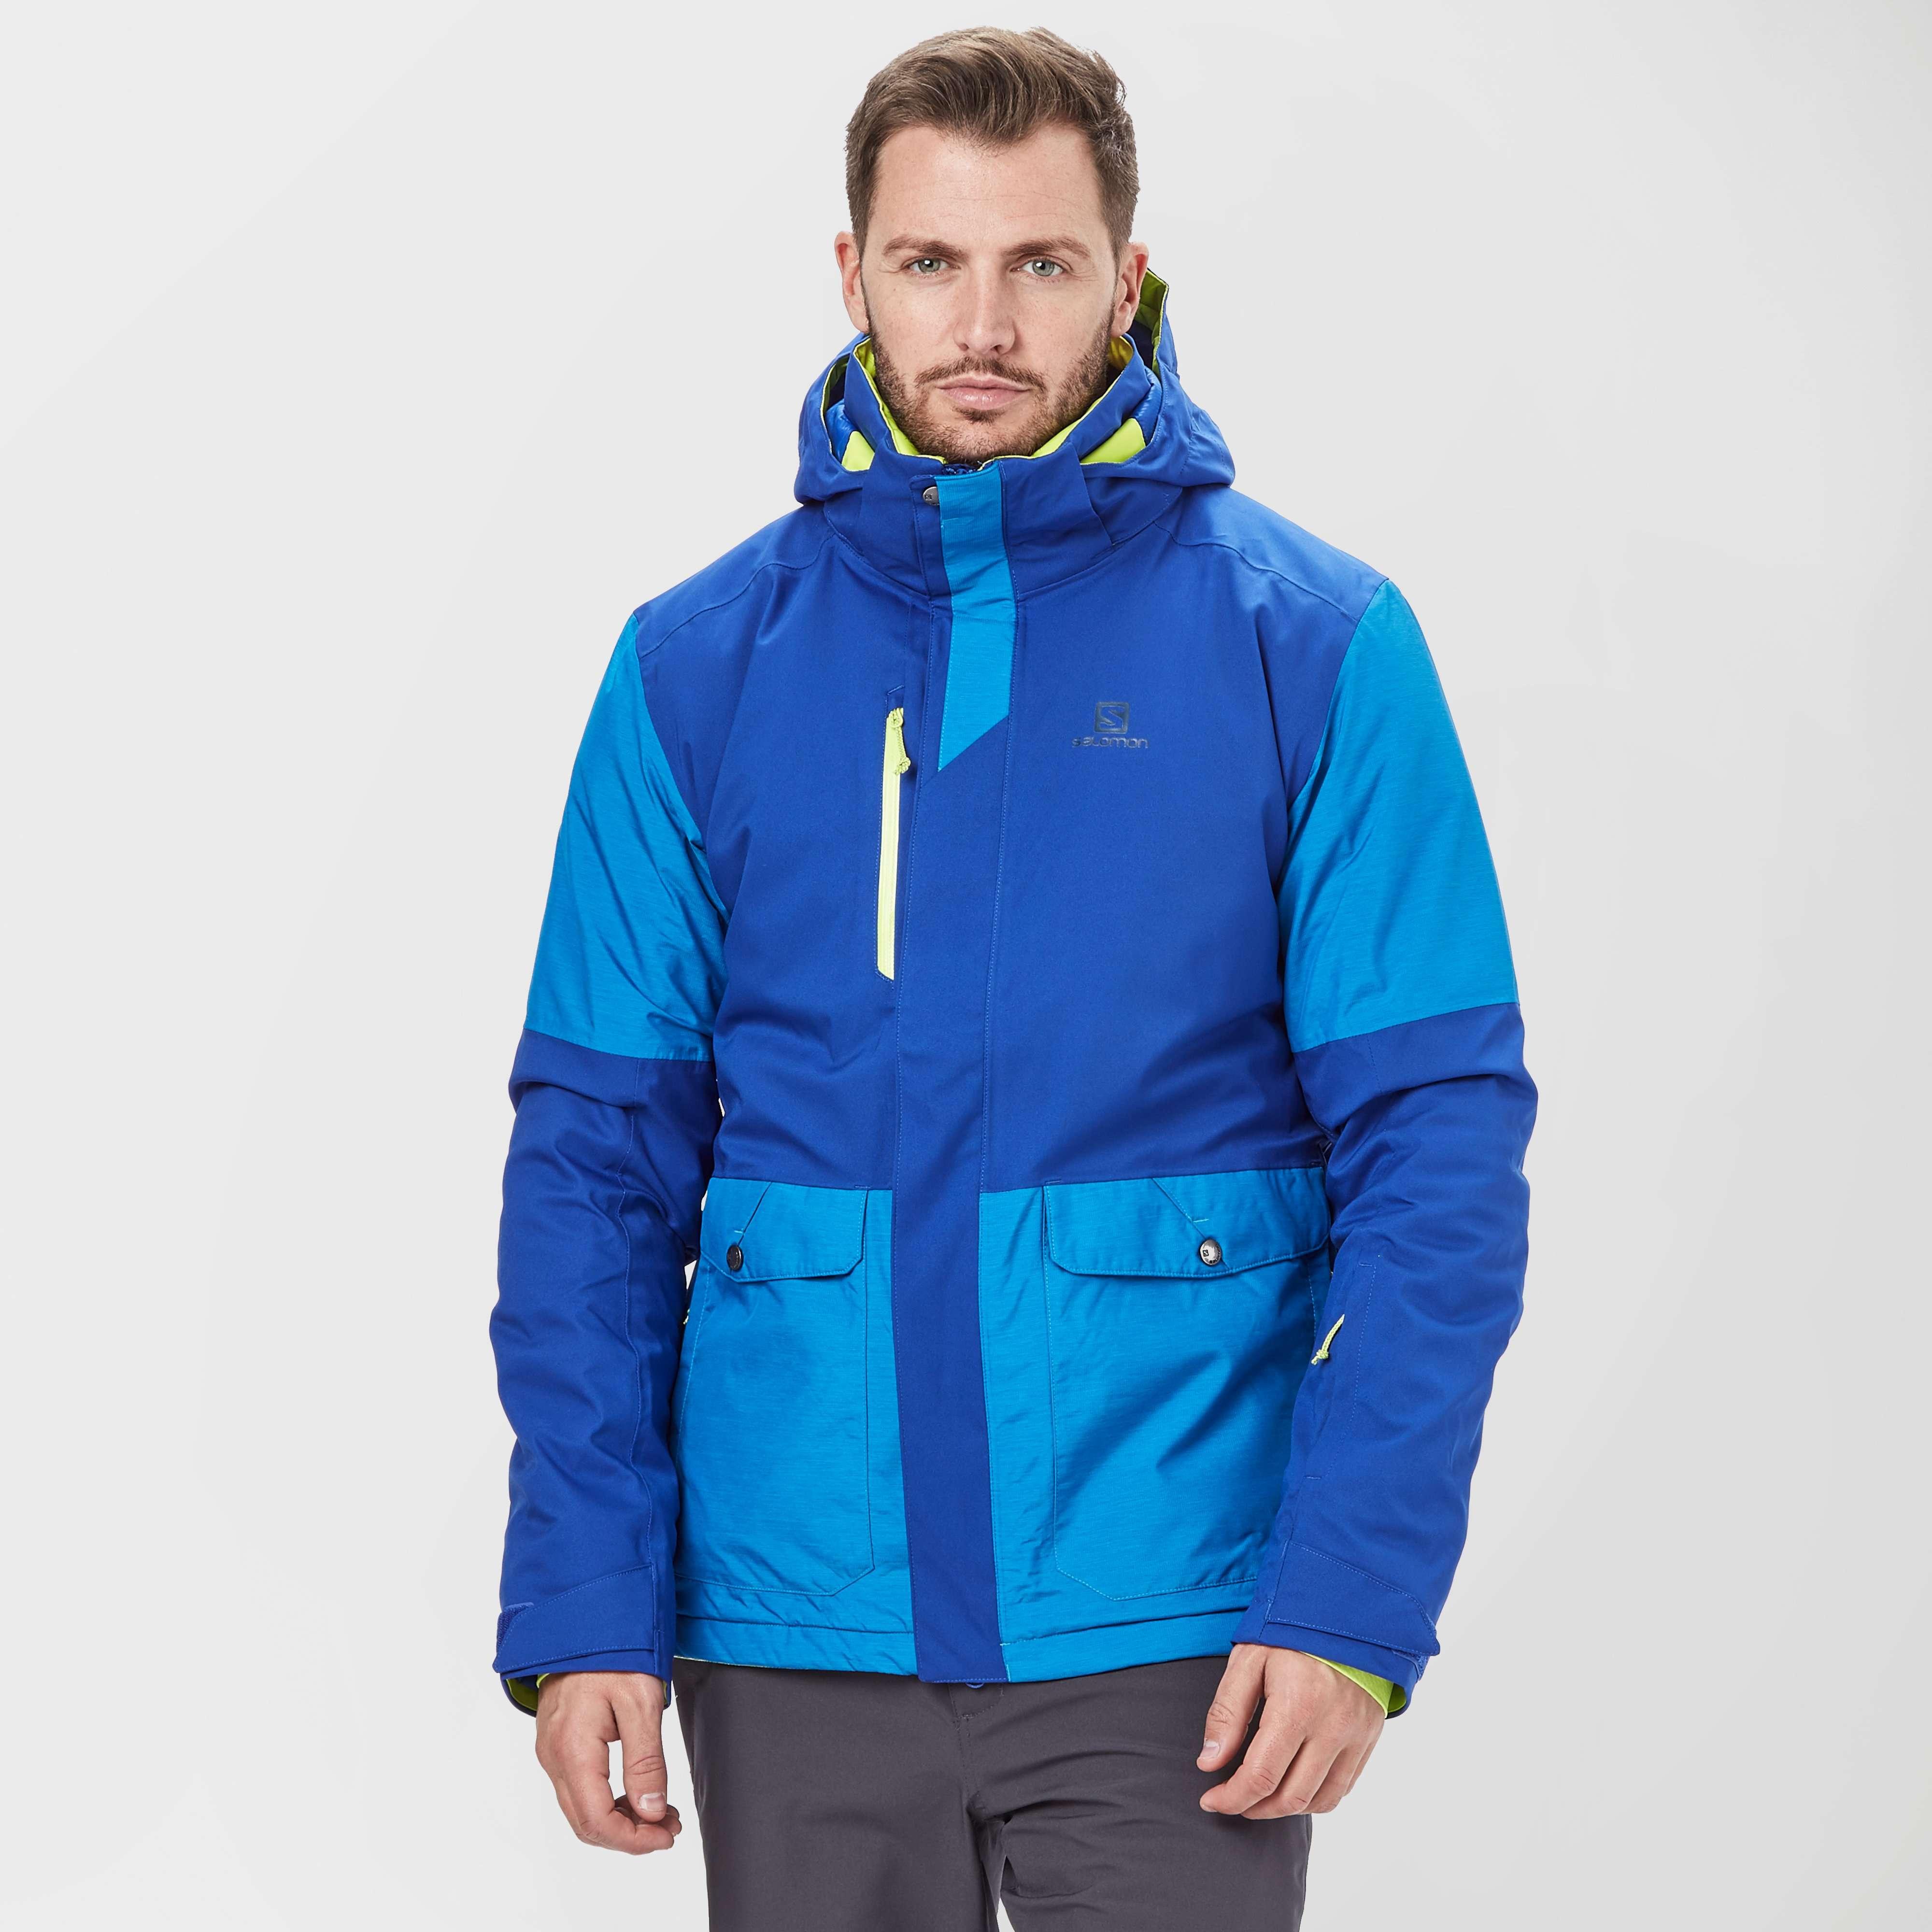 SALOMON Men's Stormtrack Ski Jacket